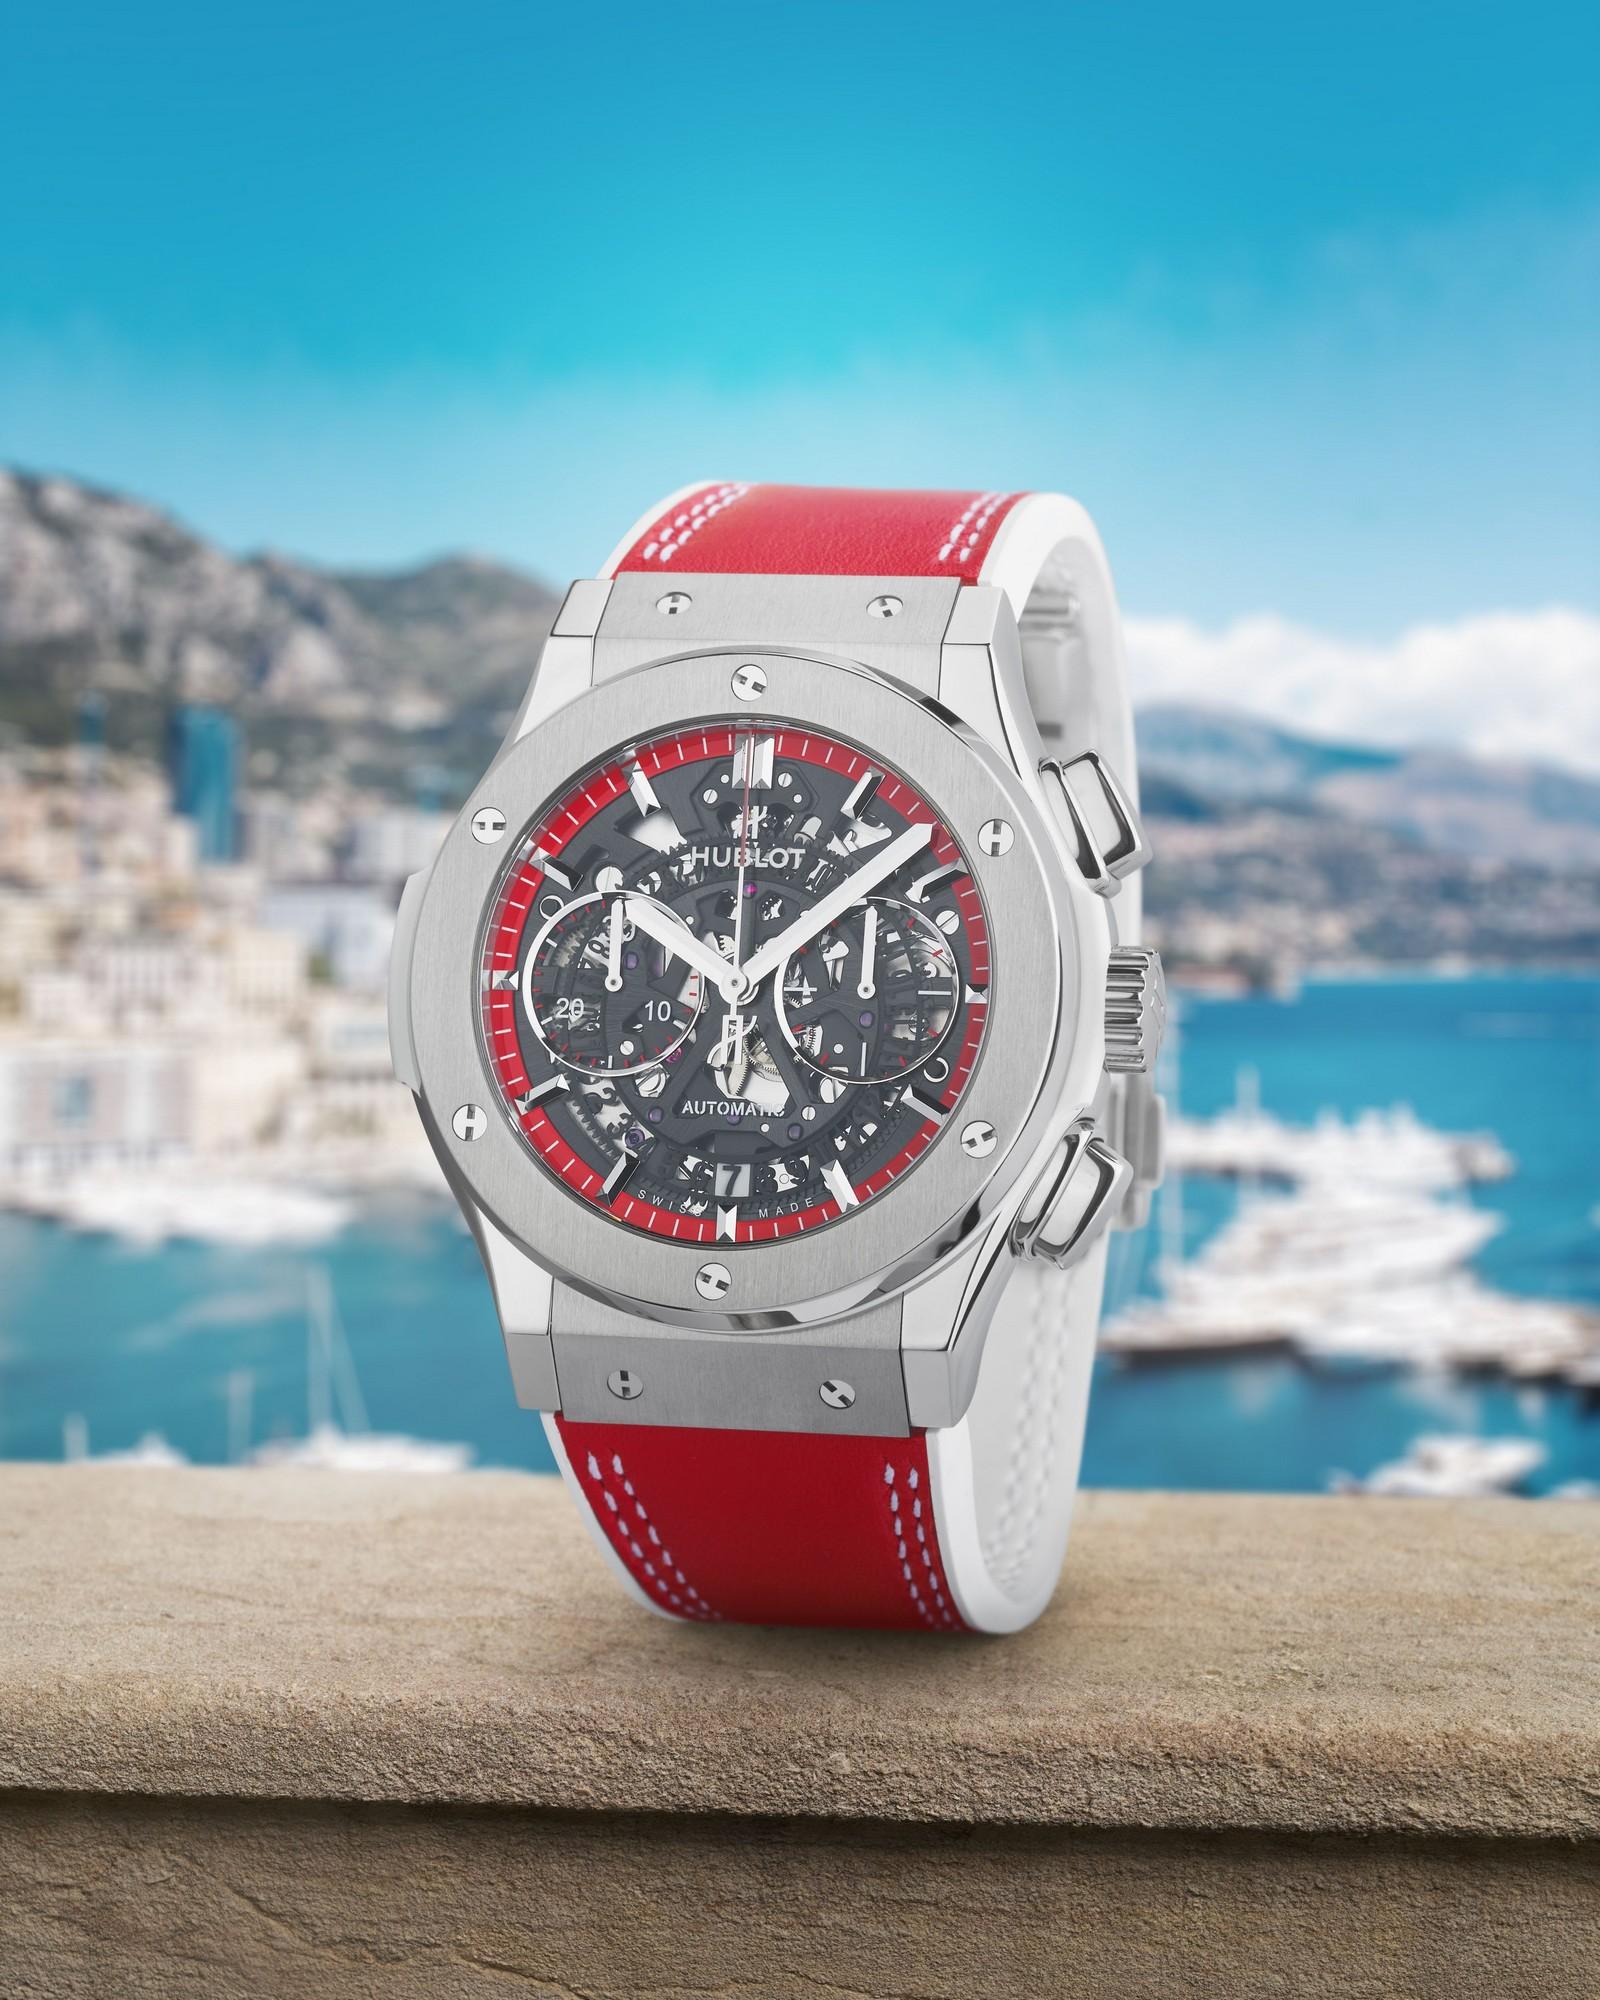 Hublot présente la Classic Fusion Aerofusion Chronograph Special Edition 'Boutique Monaco'